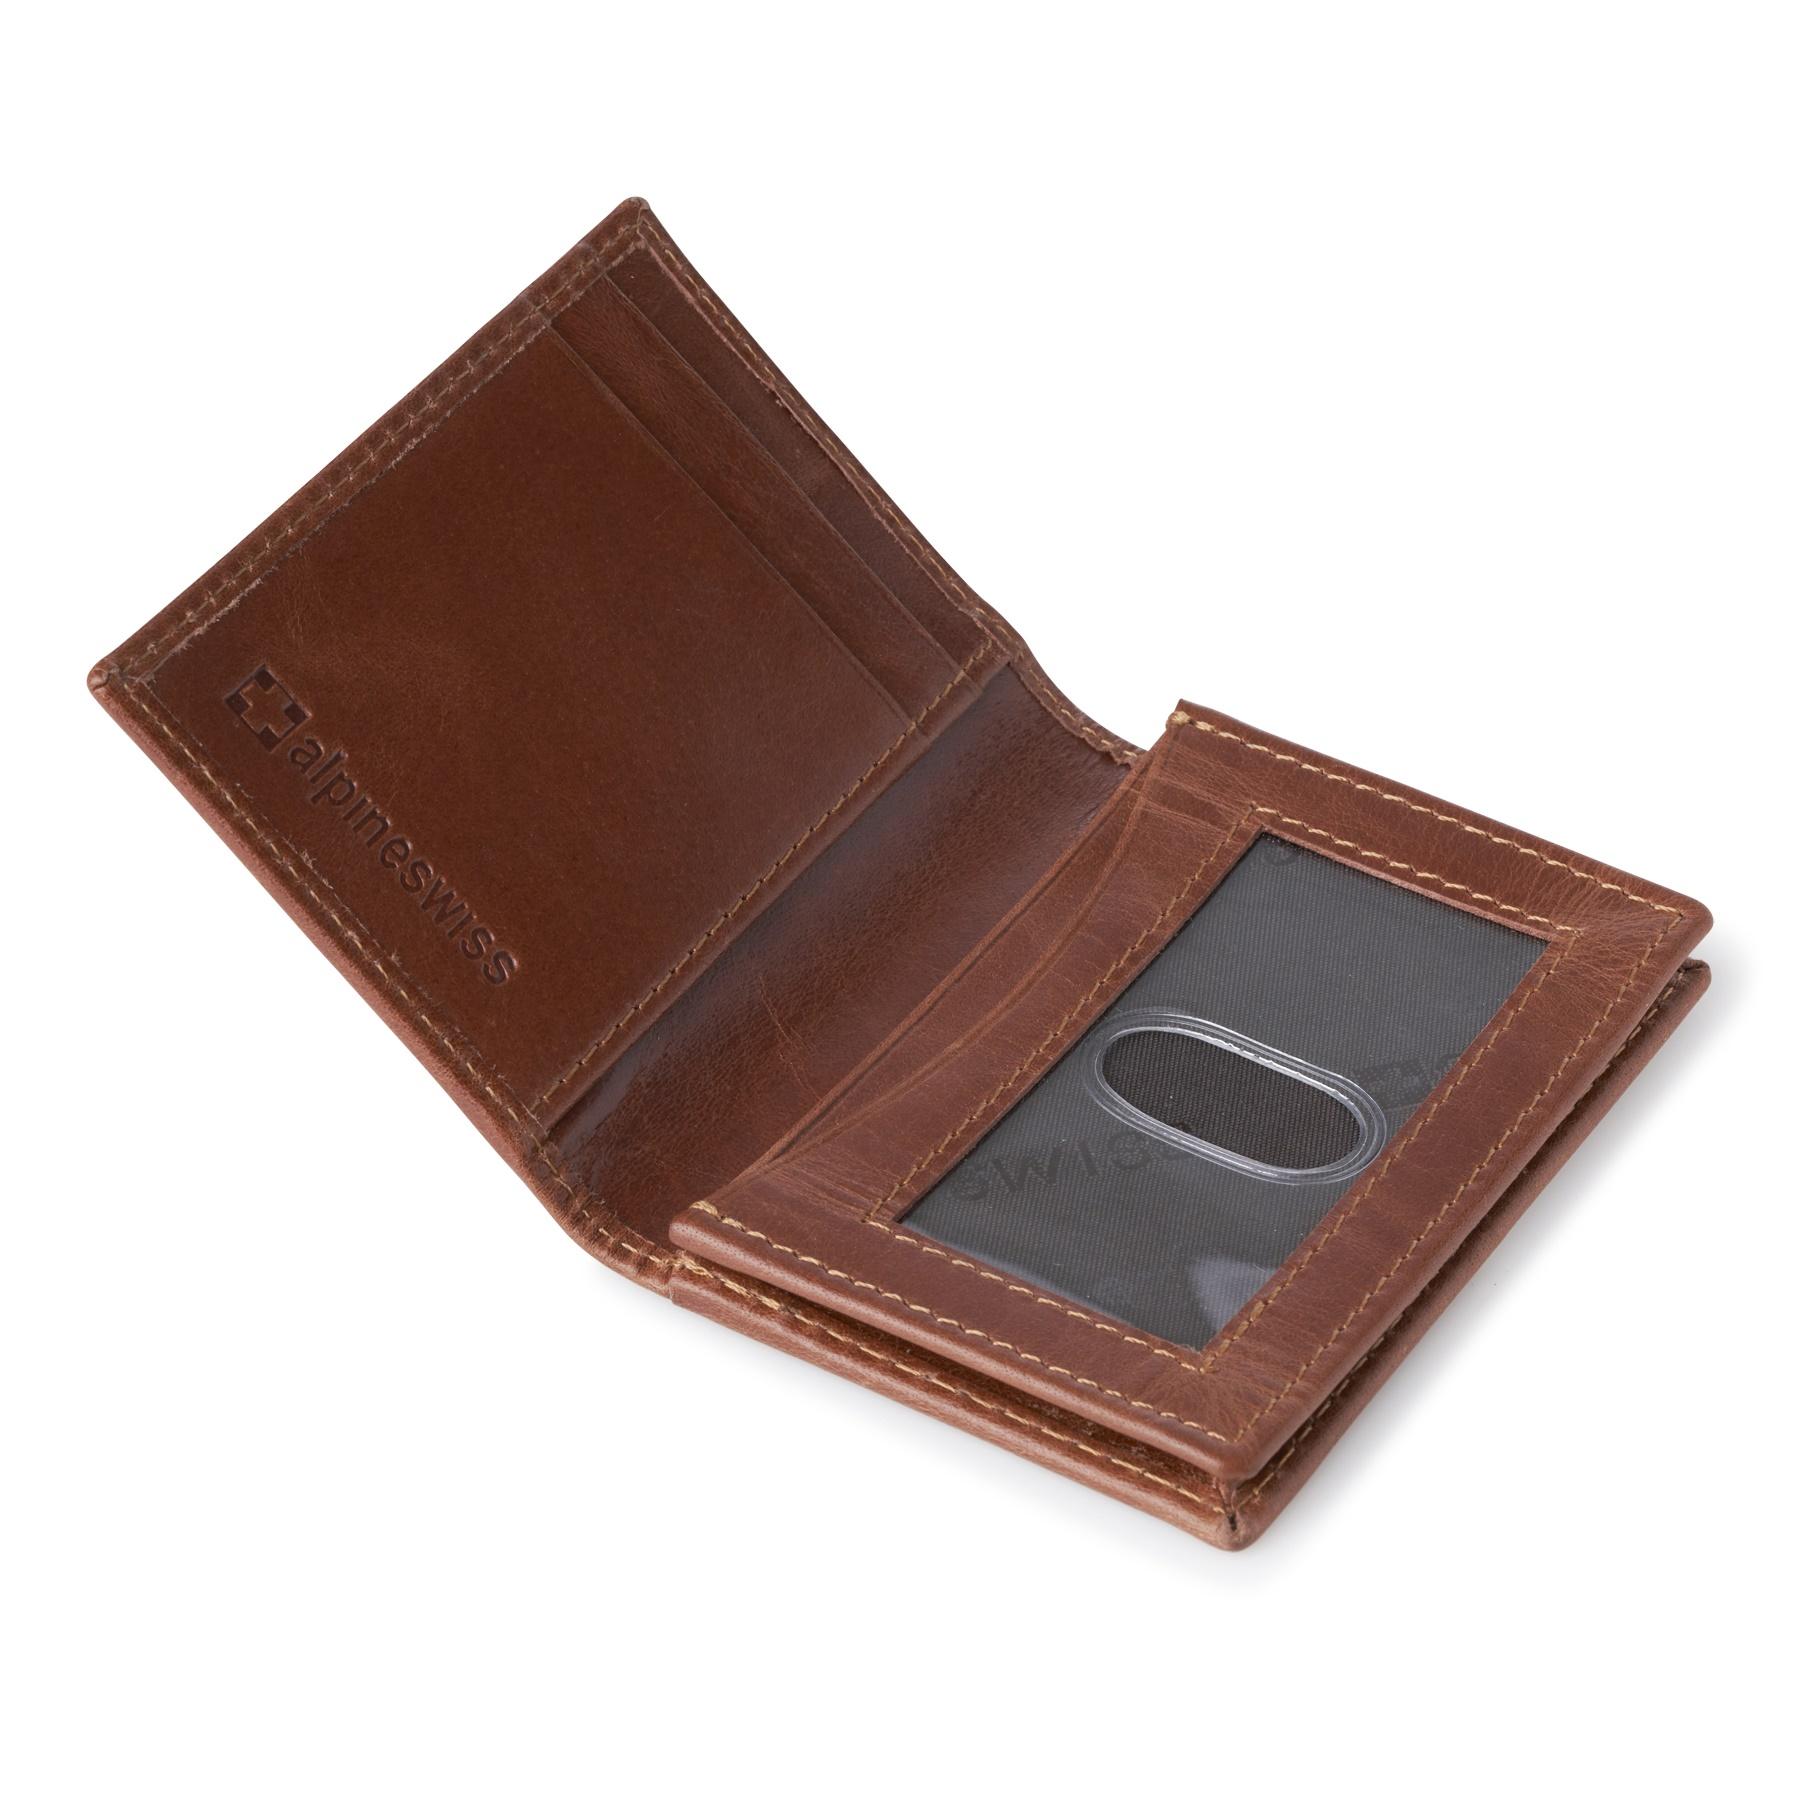 Alpine-Swiss-RFID-Leather-Business-Card-Wallet-Minimalist-ID-Window-Card-Holder thumbnail 24